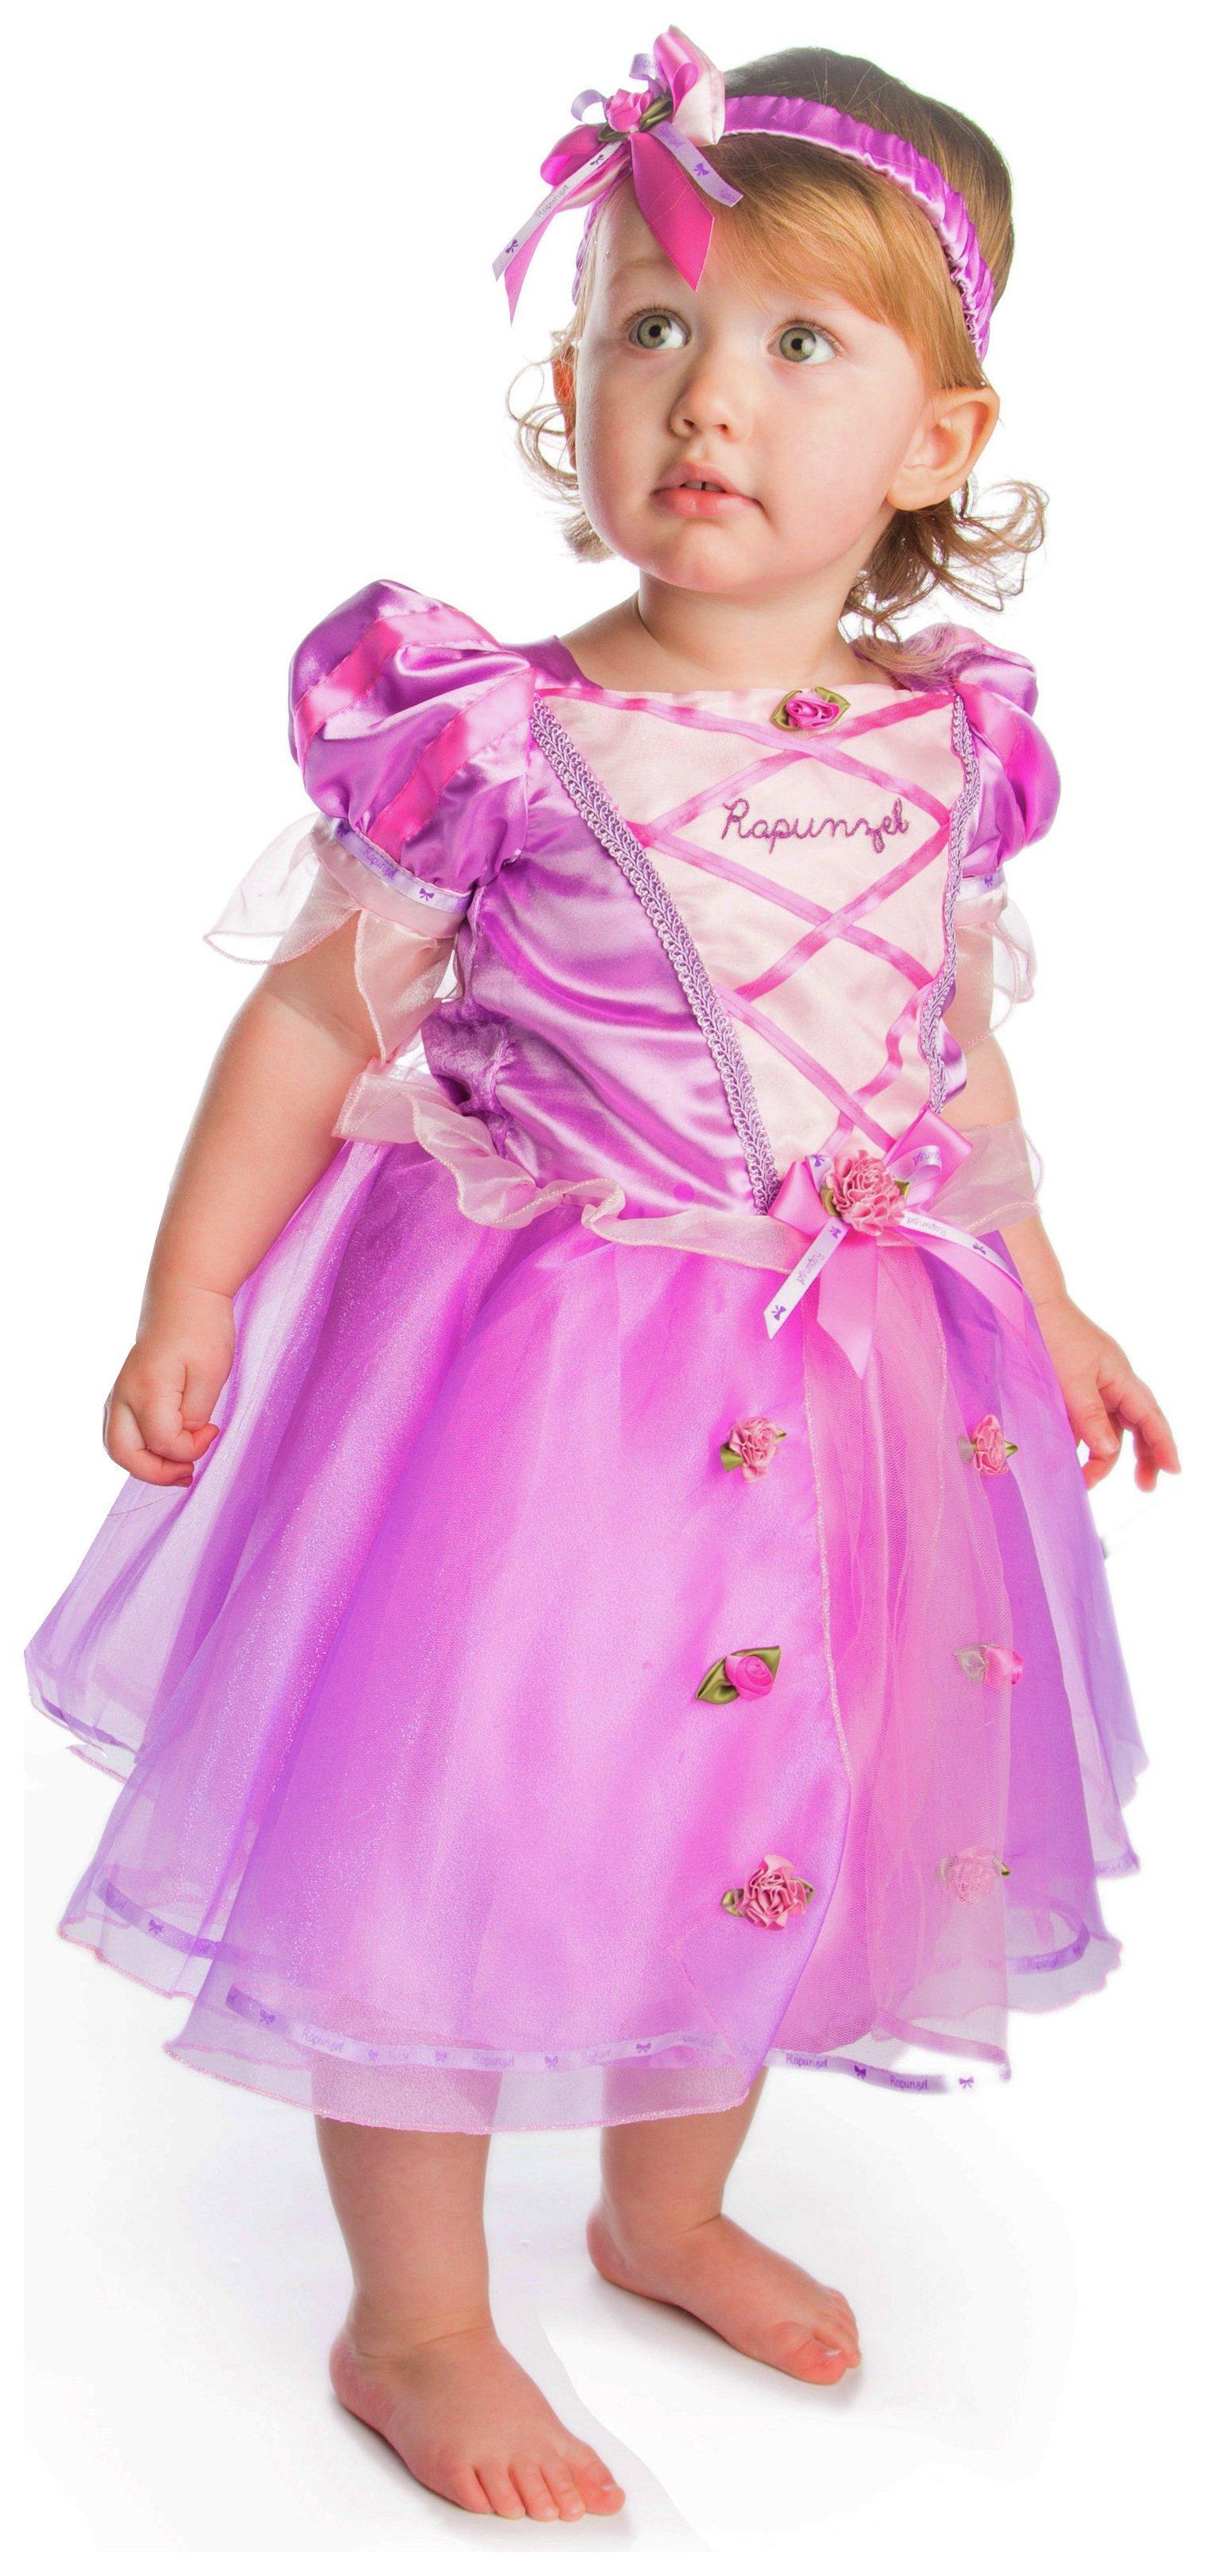 Image of Disney Princess Rapunzel - 3 to 6 months.